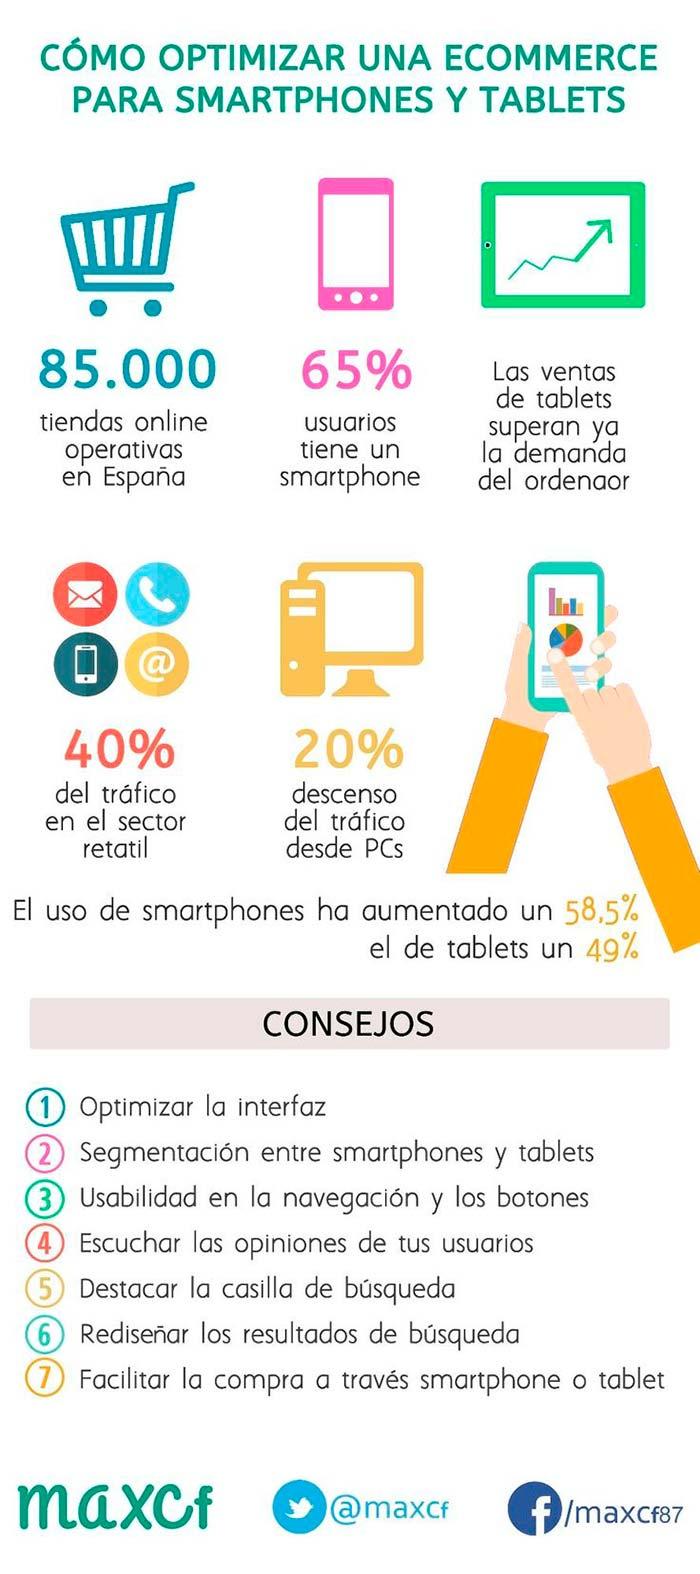 Infografia sobre como optimizar el ecommerce para smartphones y tablets